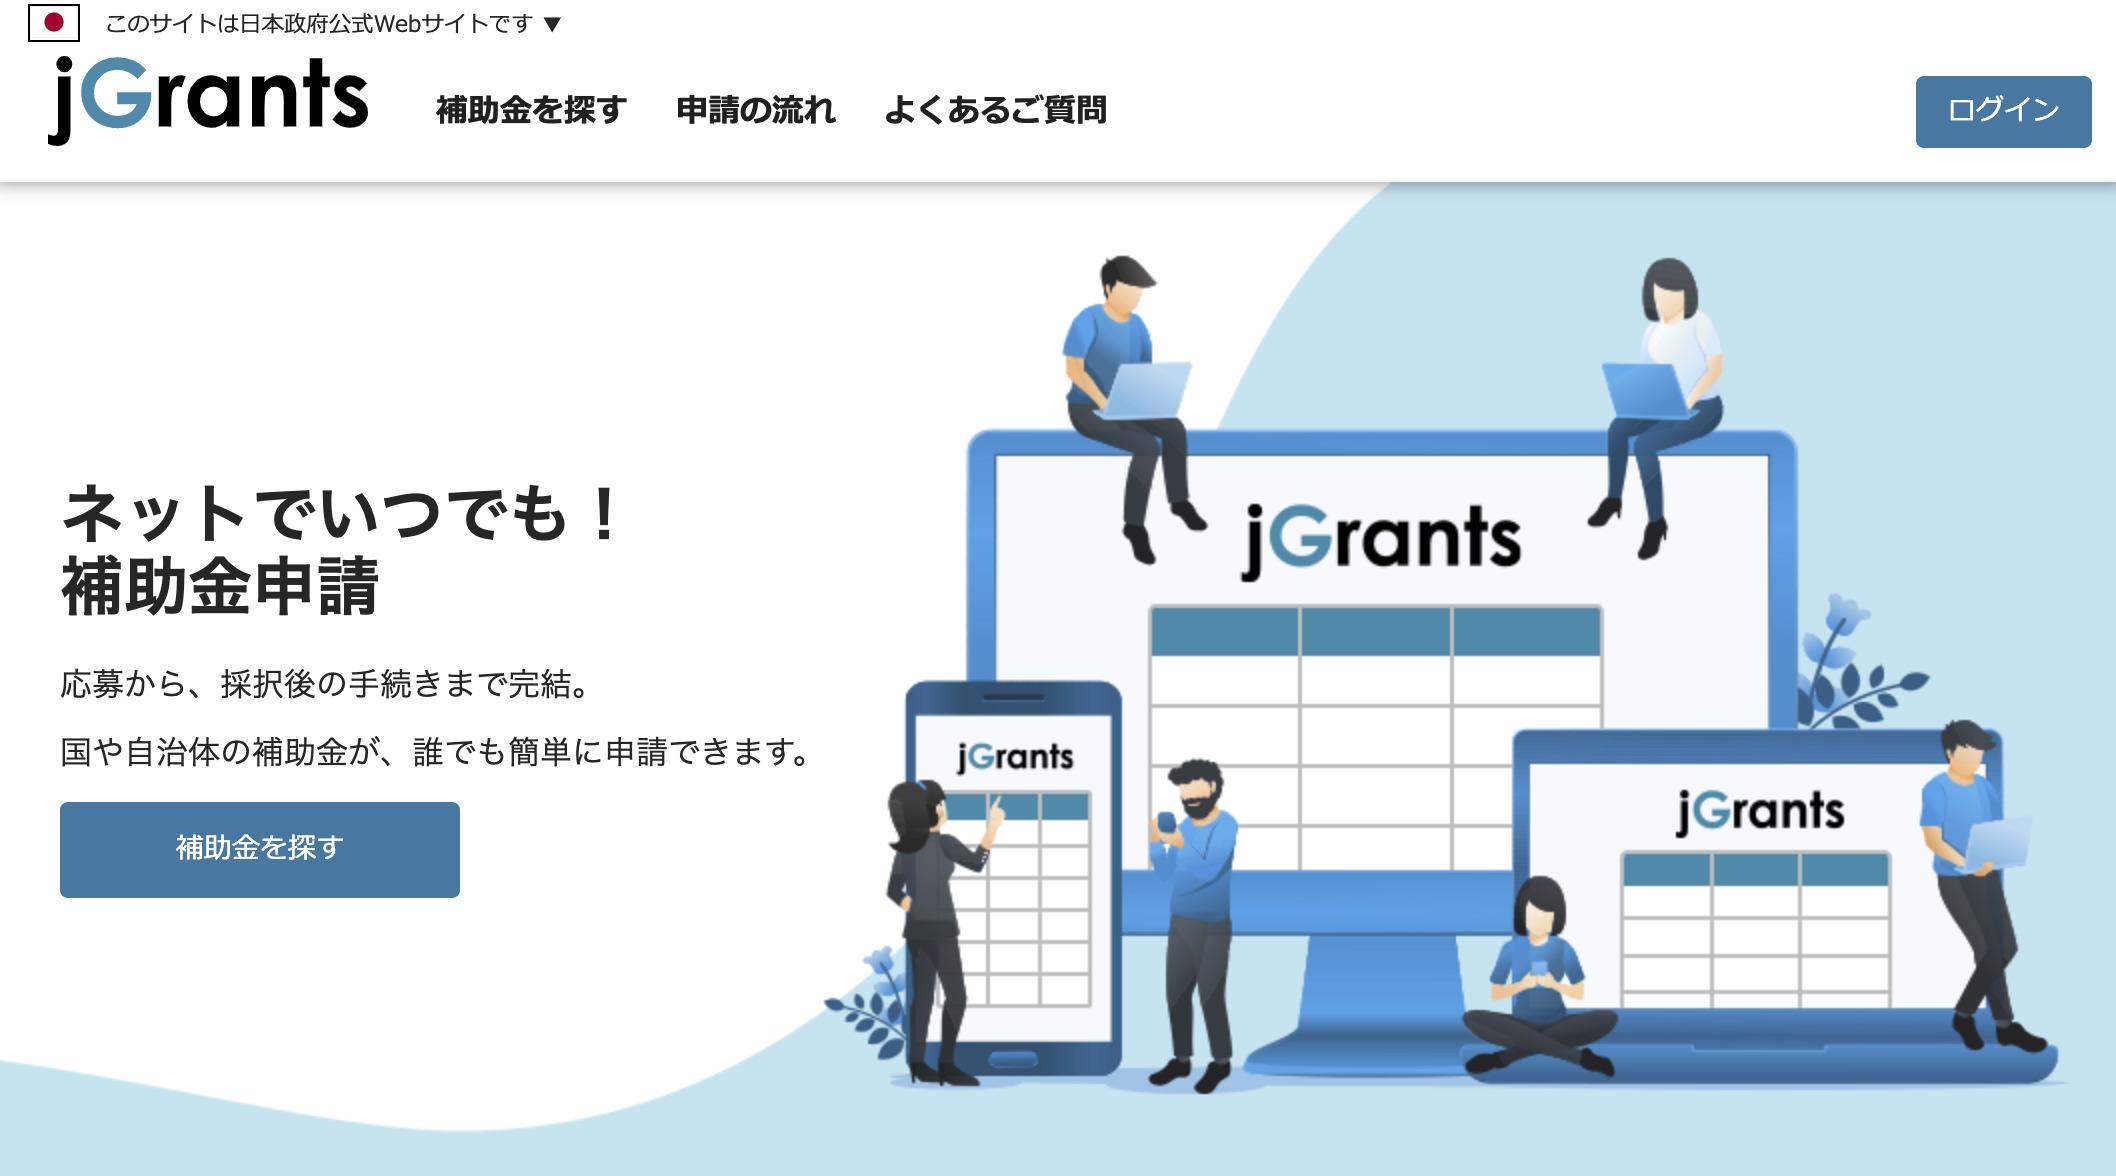 Jグランツ公式サイト( jgrants-portal.go.jp )